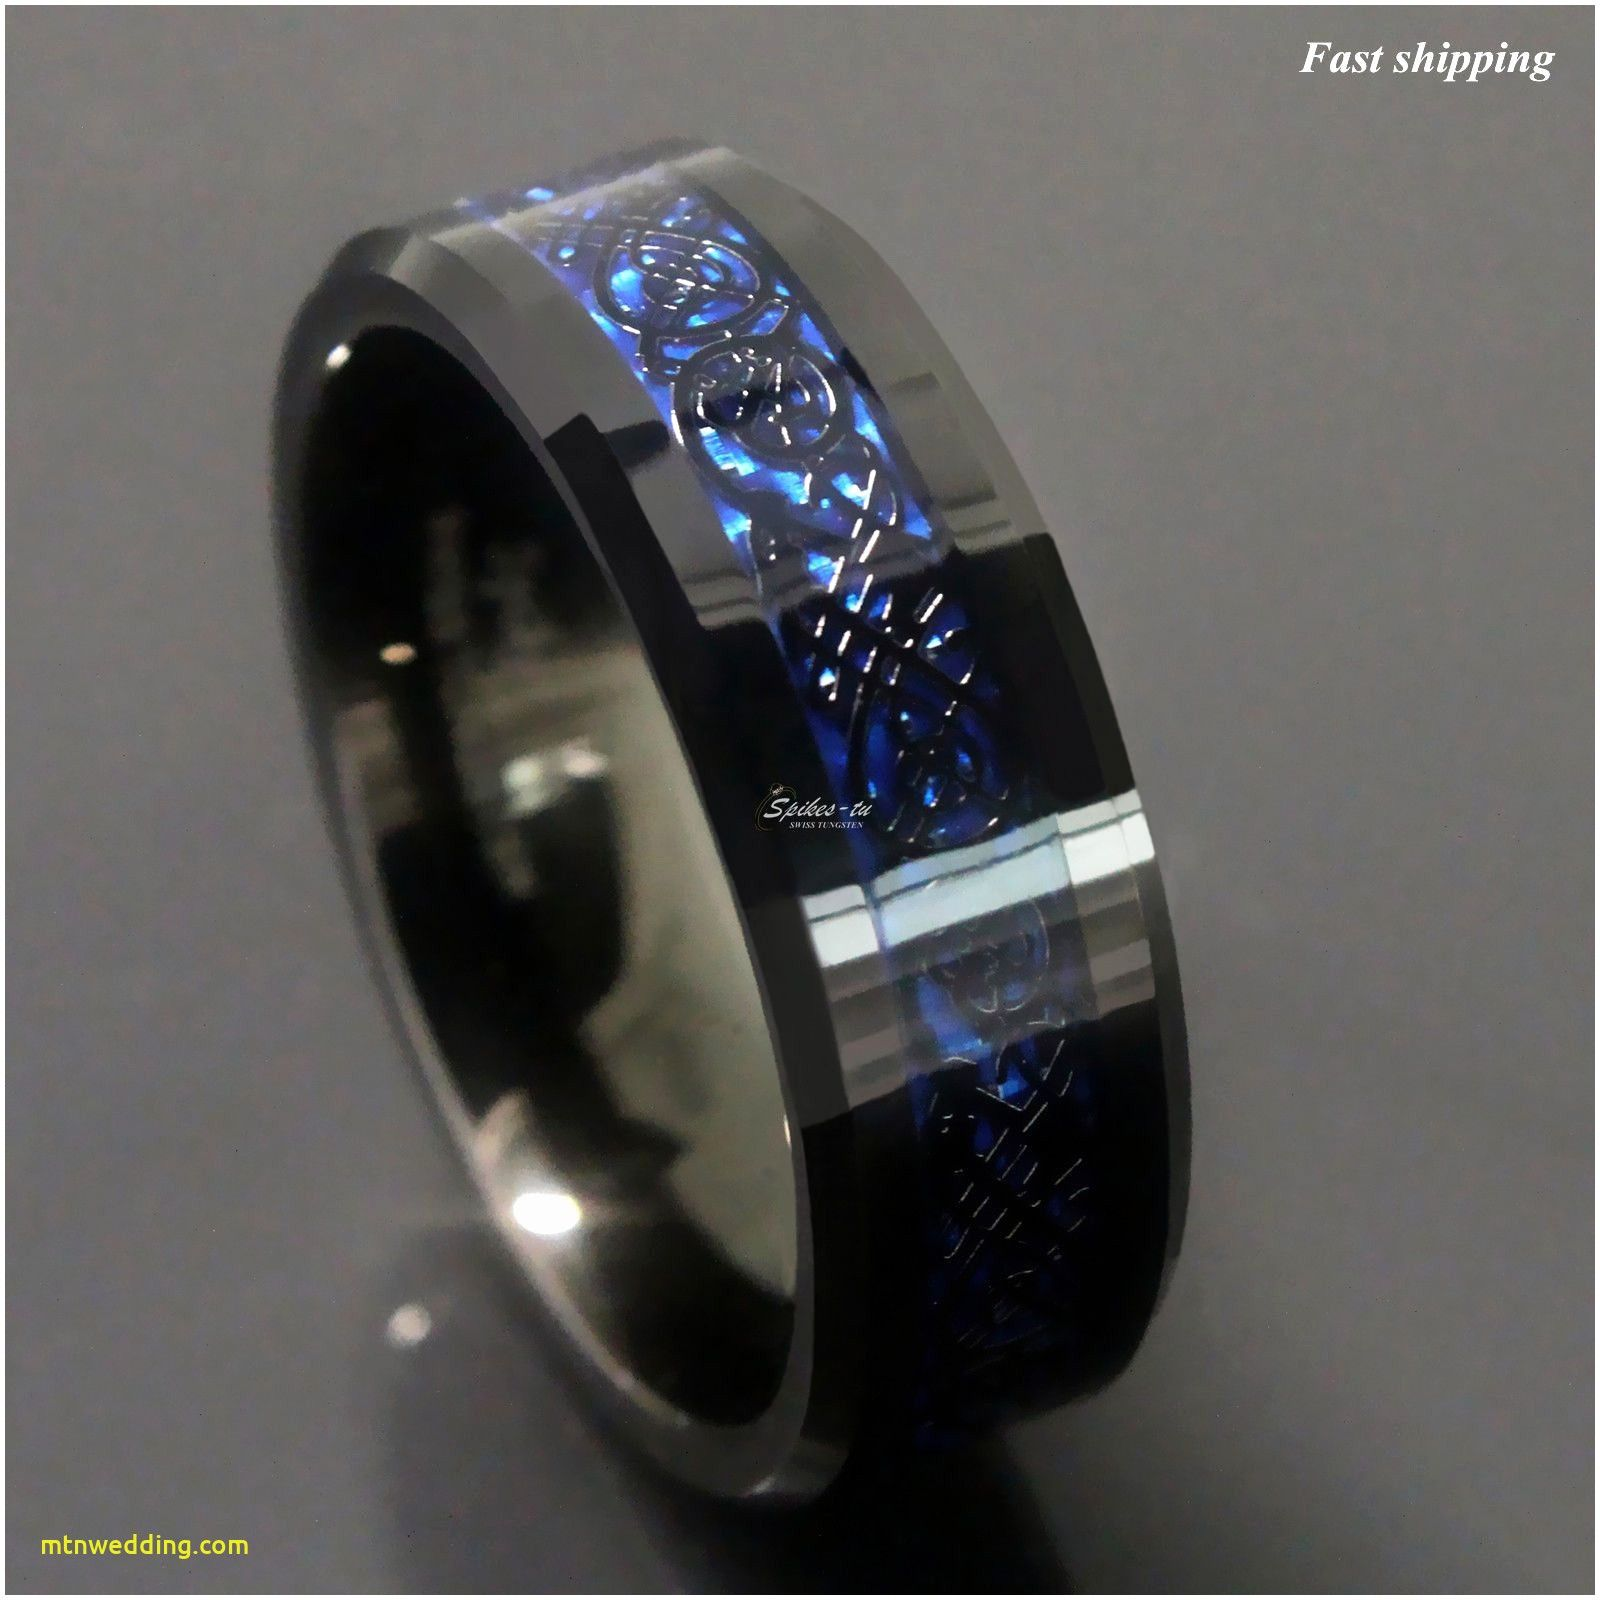 Unique Blue Diamond Mens Wedding Ring Check More At Http Mtnwedding Com Wedding Ring Blue Diamond Mens Wedding Ri Perhiasan Pria Cincin Perhiasan Cincin Pria